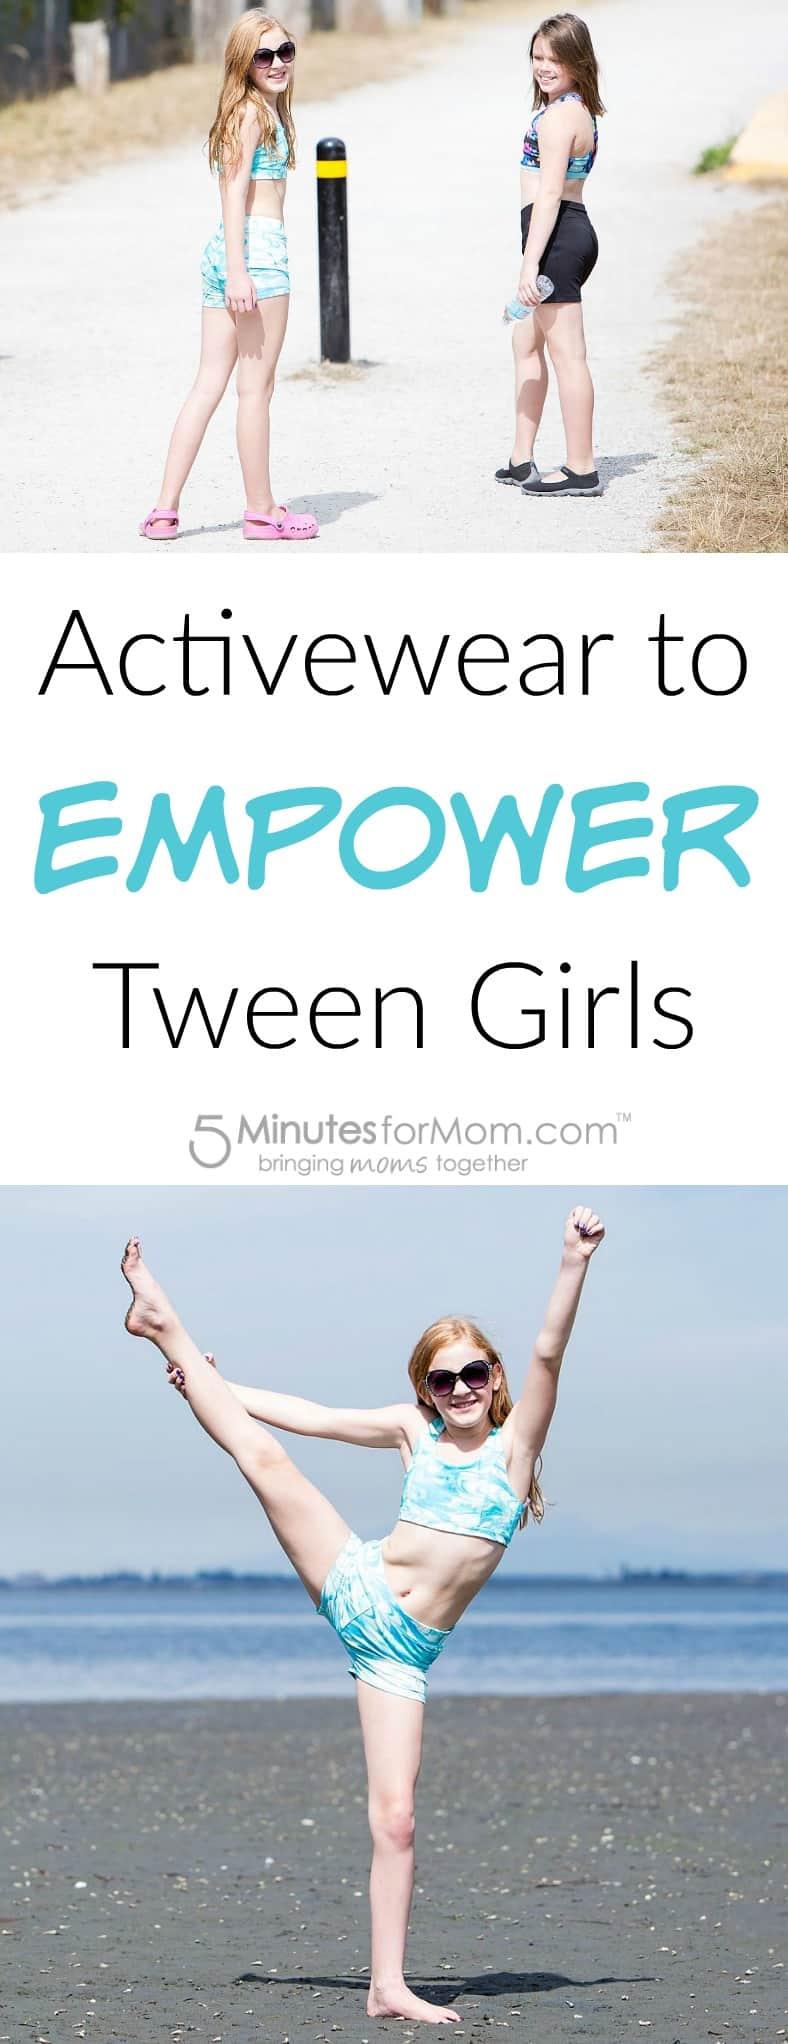 Activewear to Empower Tween Girls